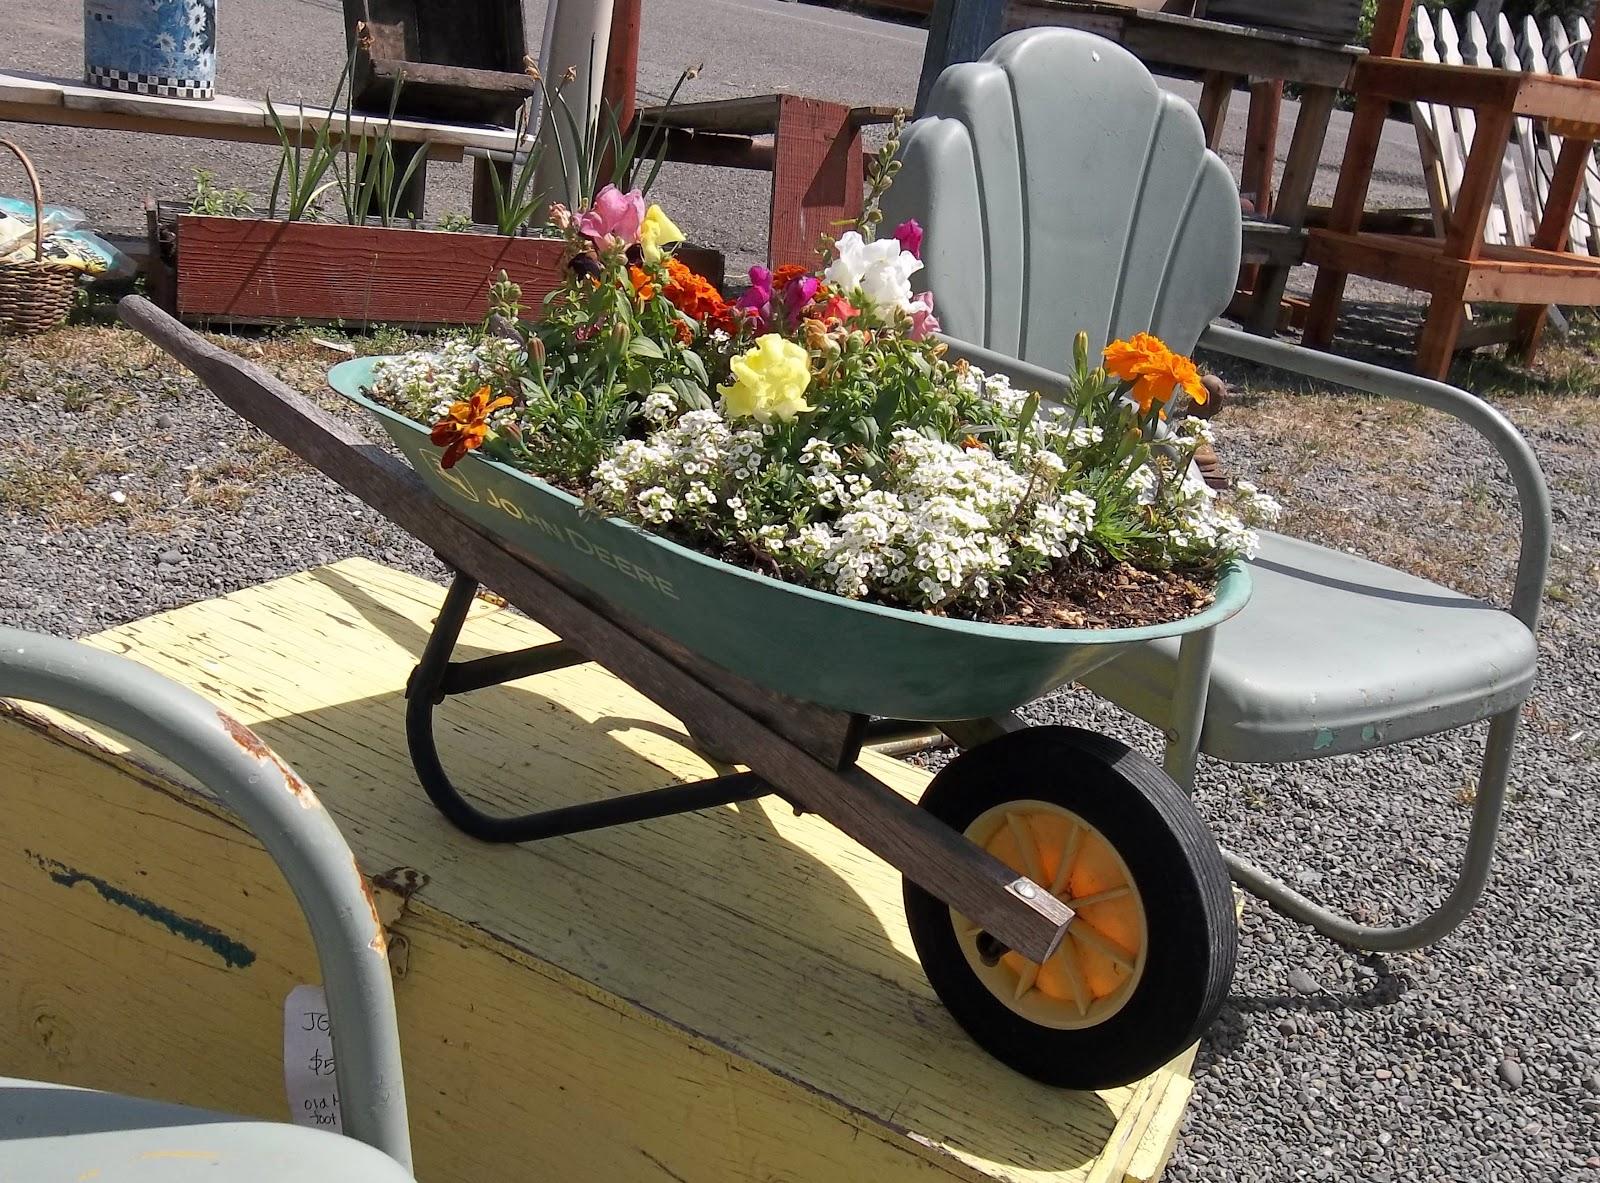 Container Garden Ideas: Gin'Gilli's Vintage Home: Unique Container Gardening Ideas